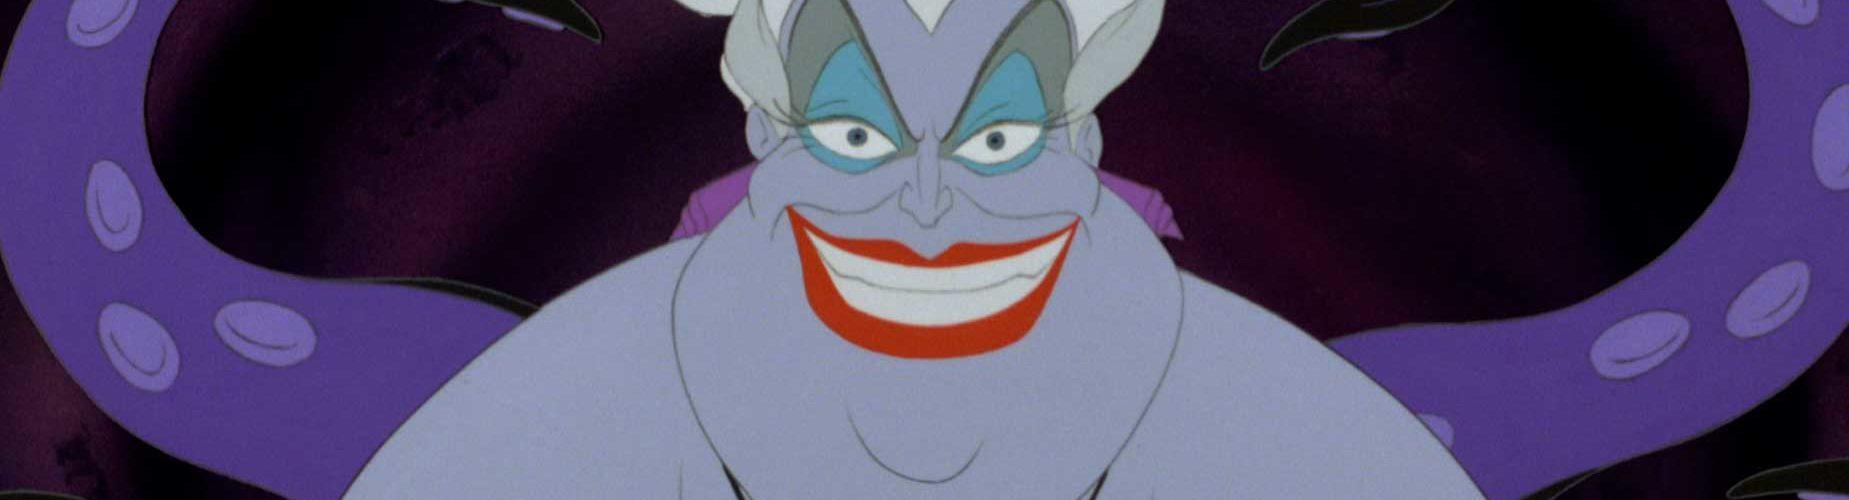 best-disney-villains-ursula